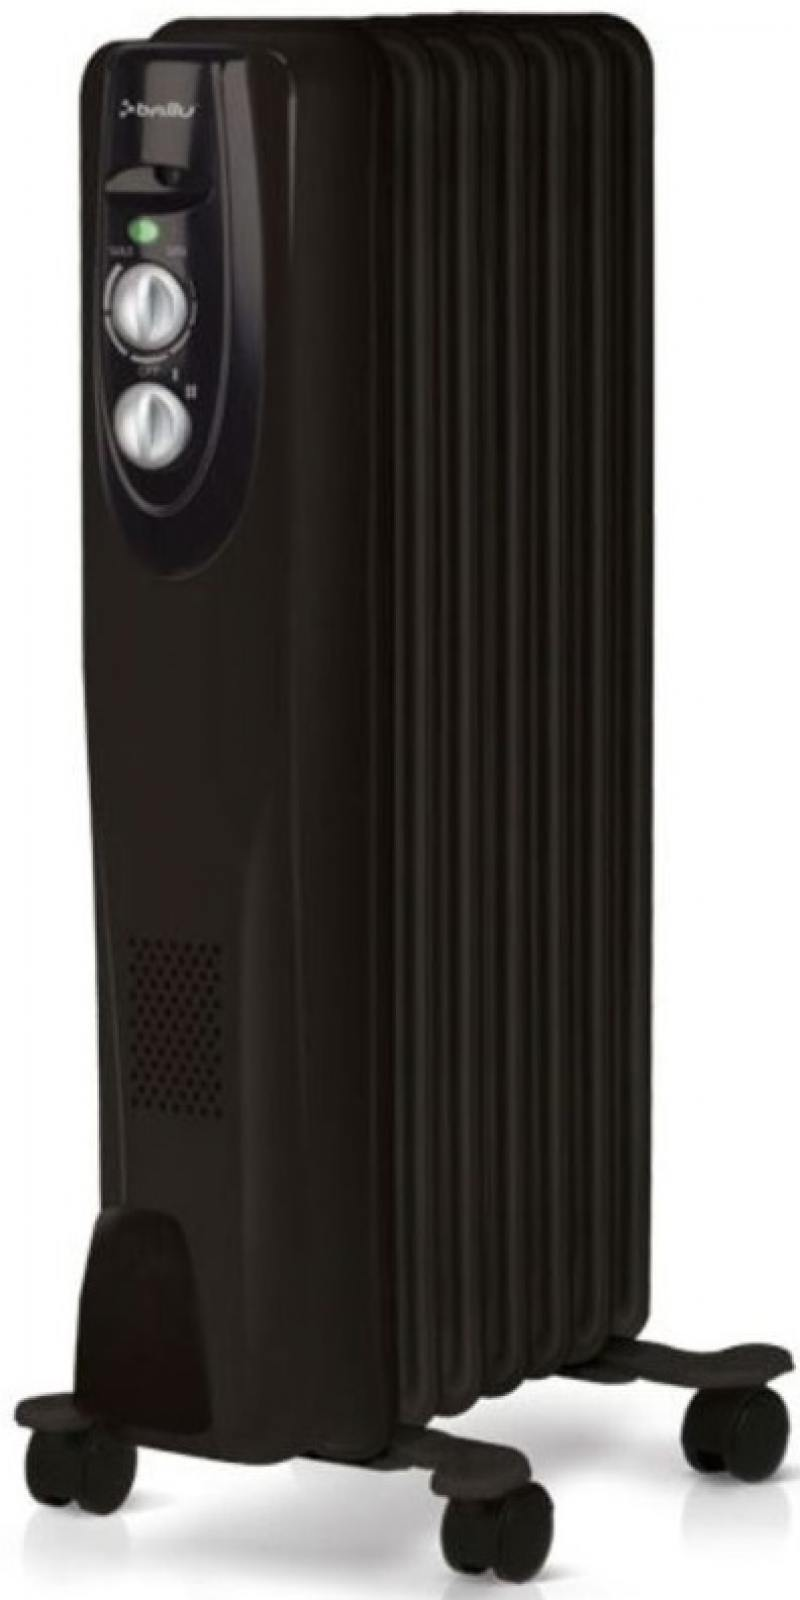 Масляный радиатор Ballu BOH/CL-07BRN 1500 Вт чёрный масляный радиатор ballu boh md 07bbn 1500 вт чёрный